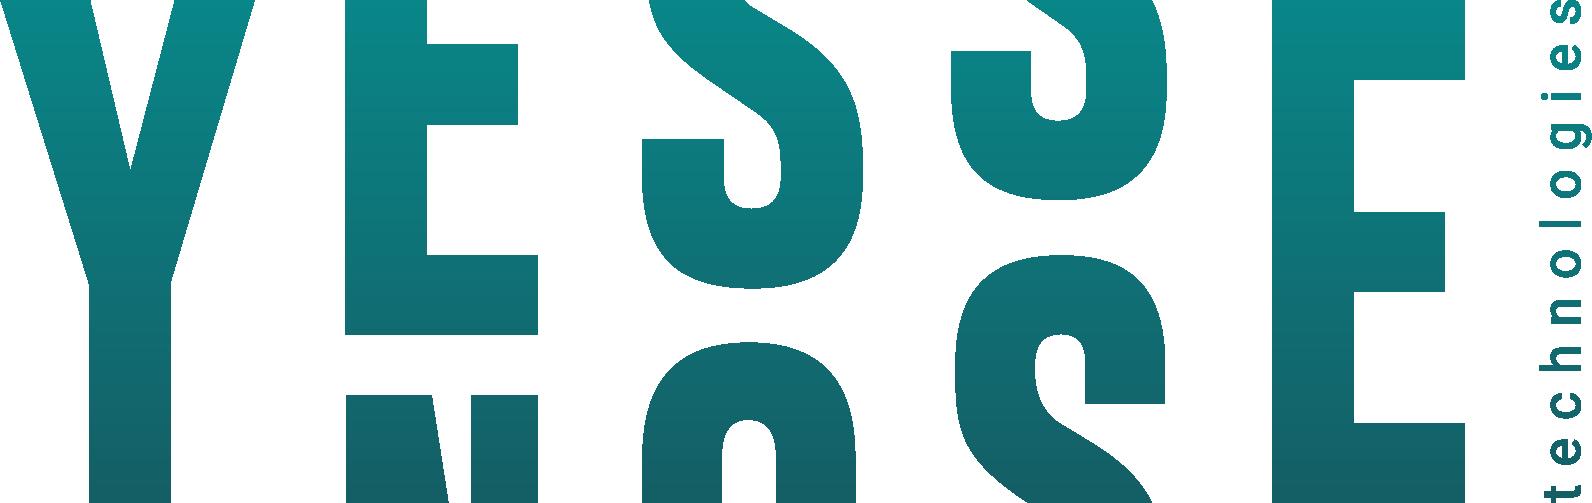 Yesse logo